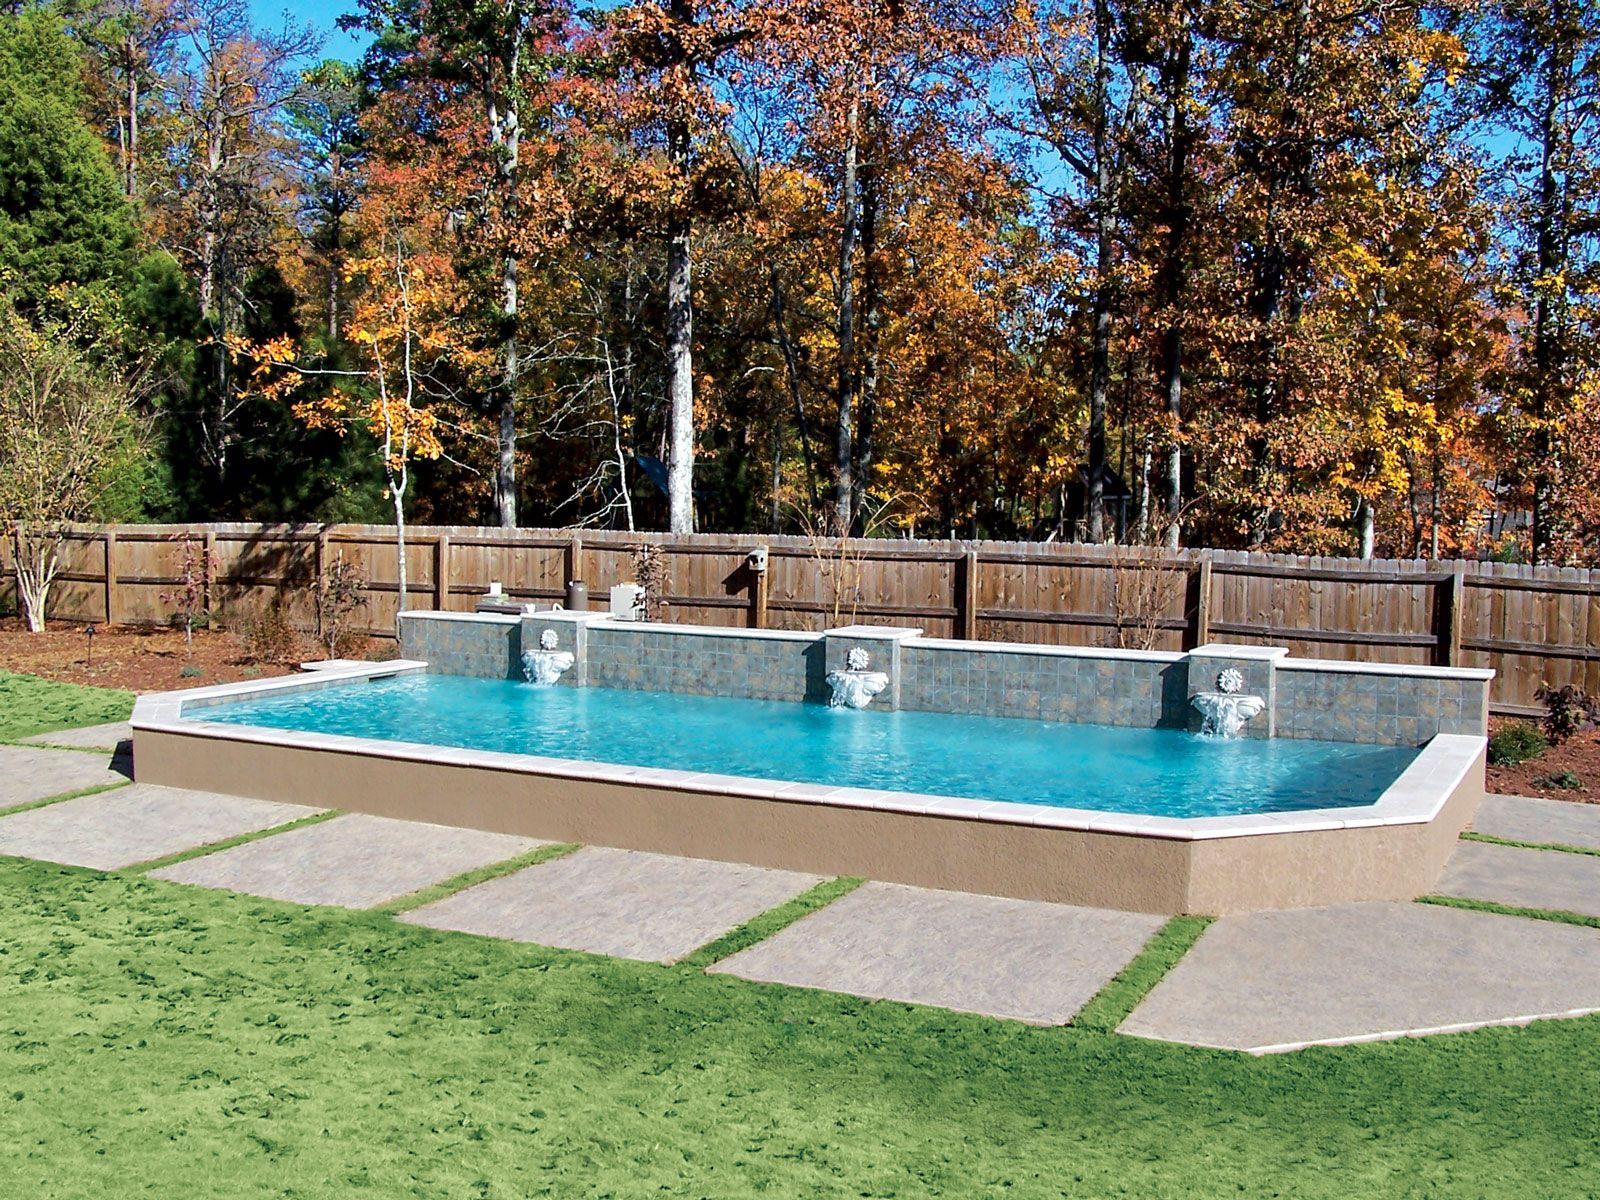 Grecian Pool built by Blue Haven Pools Atlanta.